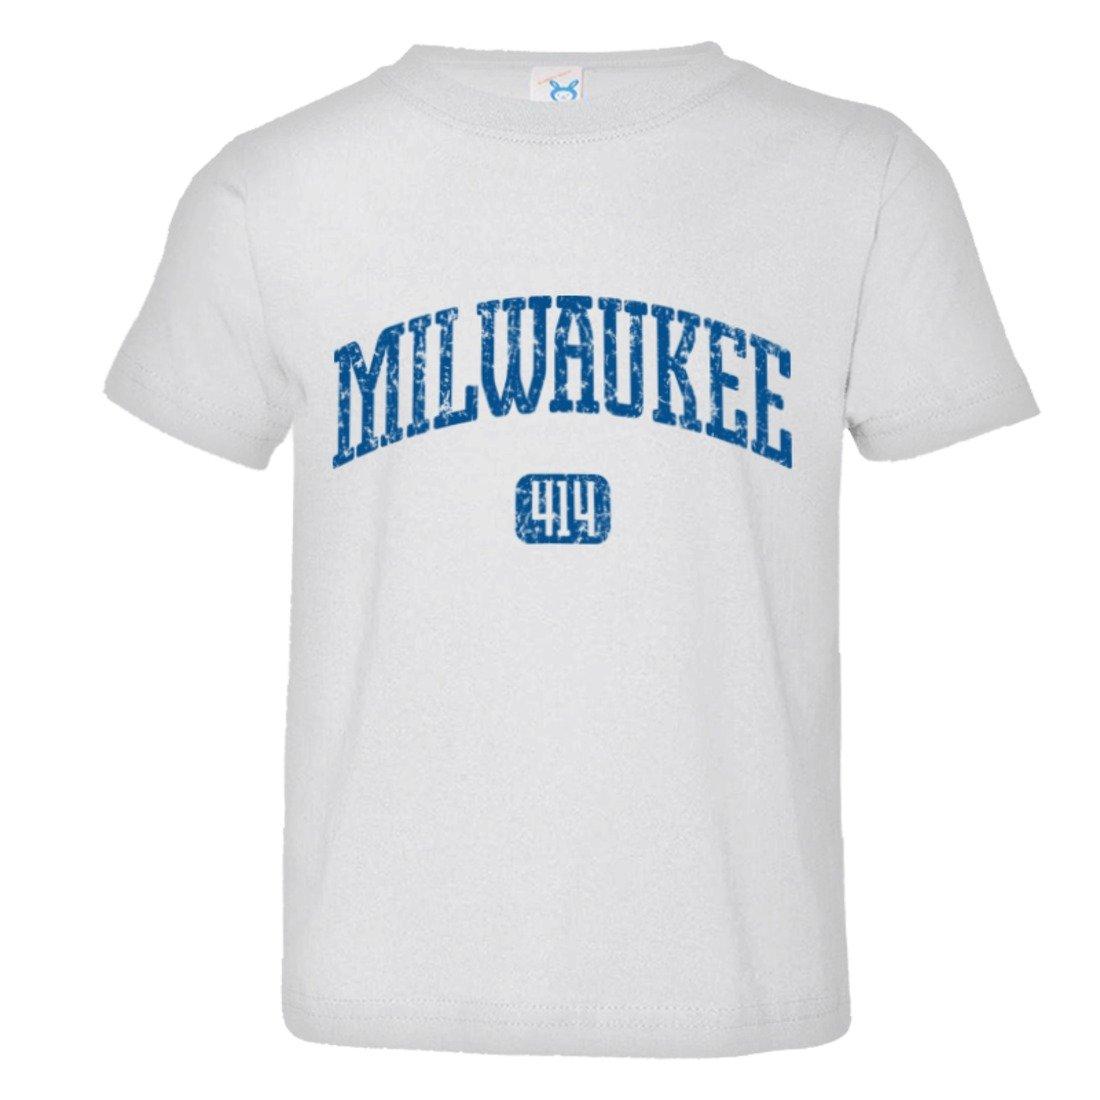 Toddler Milwaukee Vintage Distressed Original Home HQ Tee Shirt